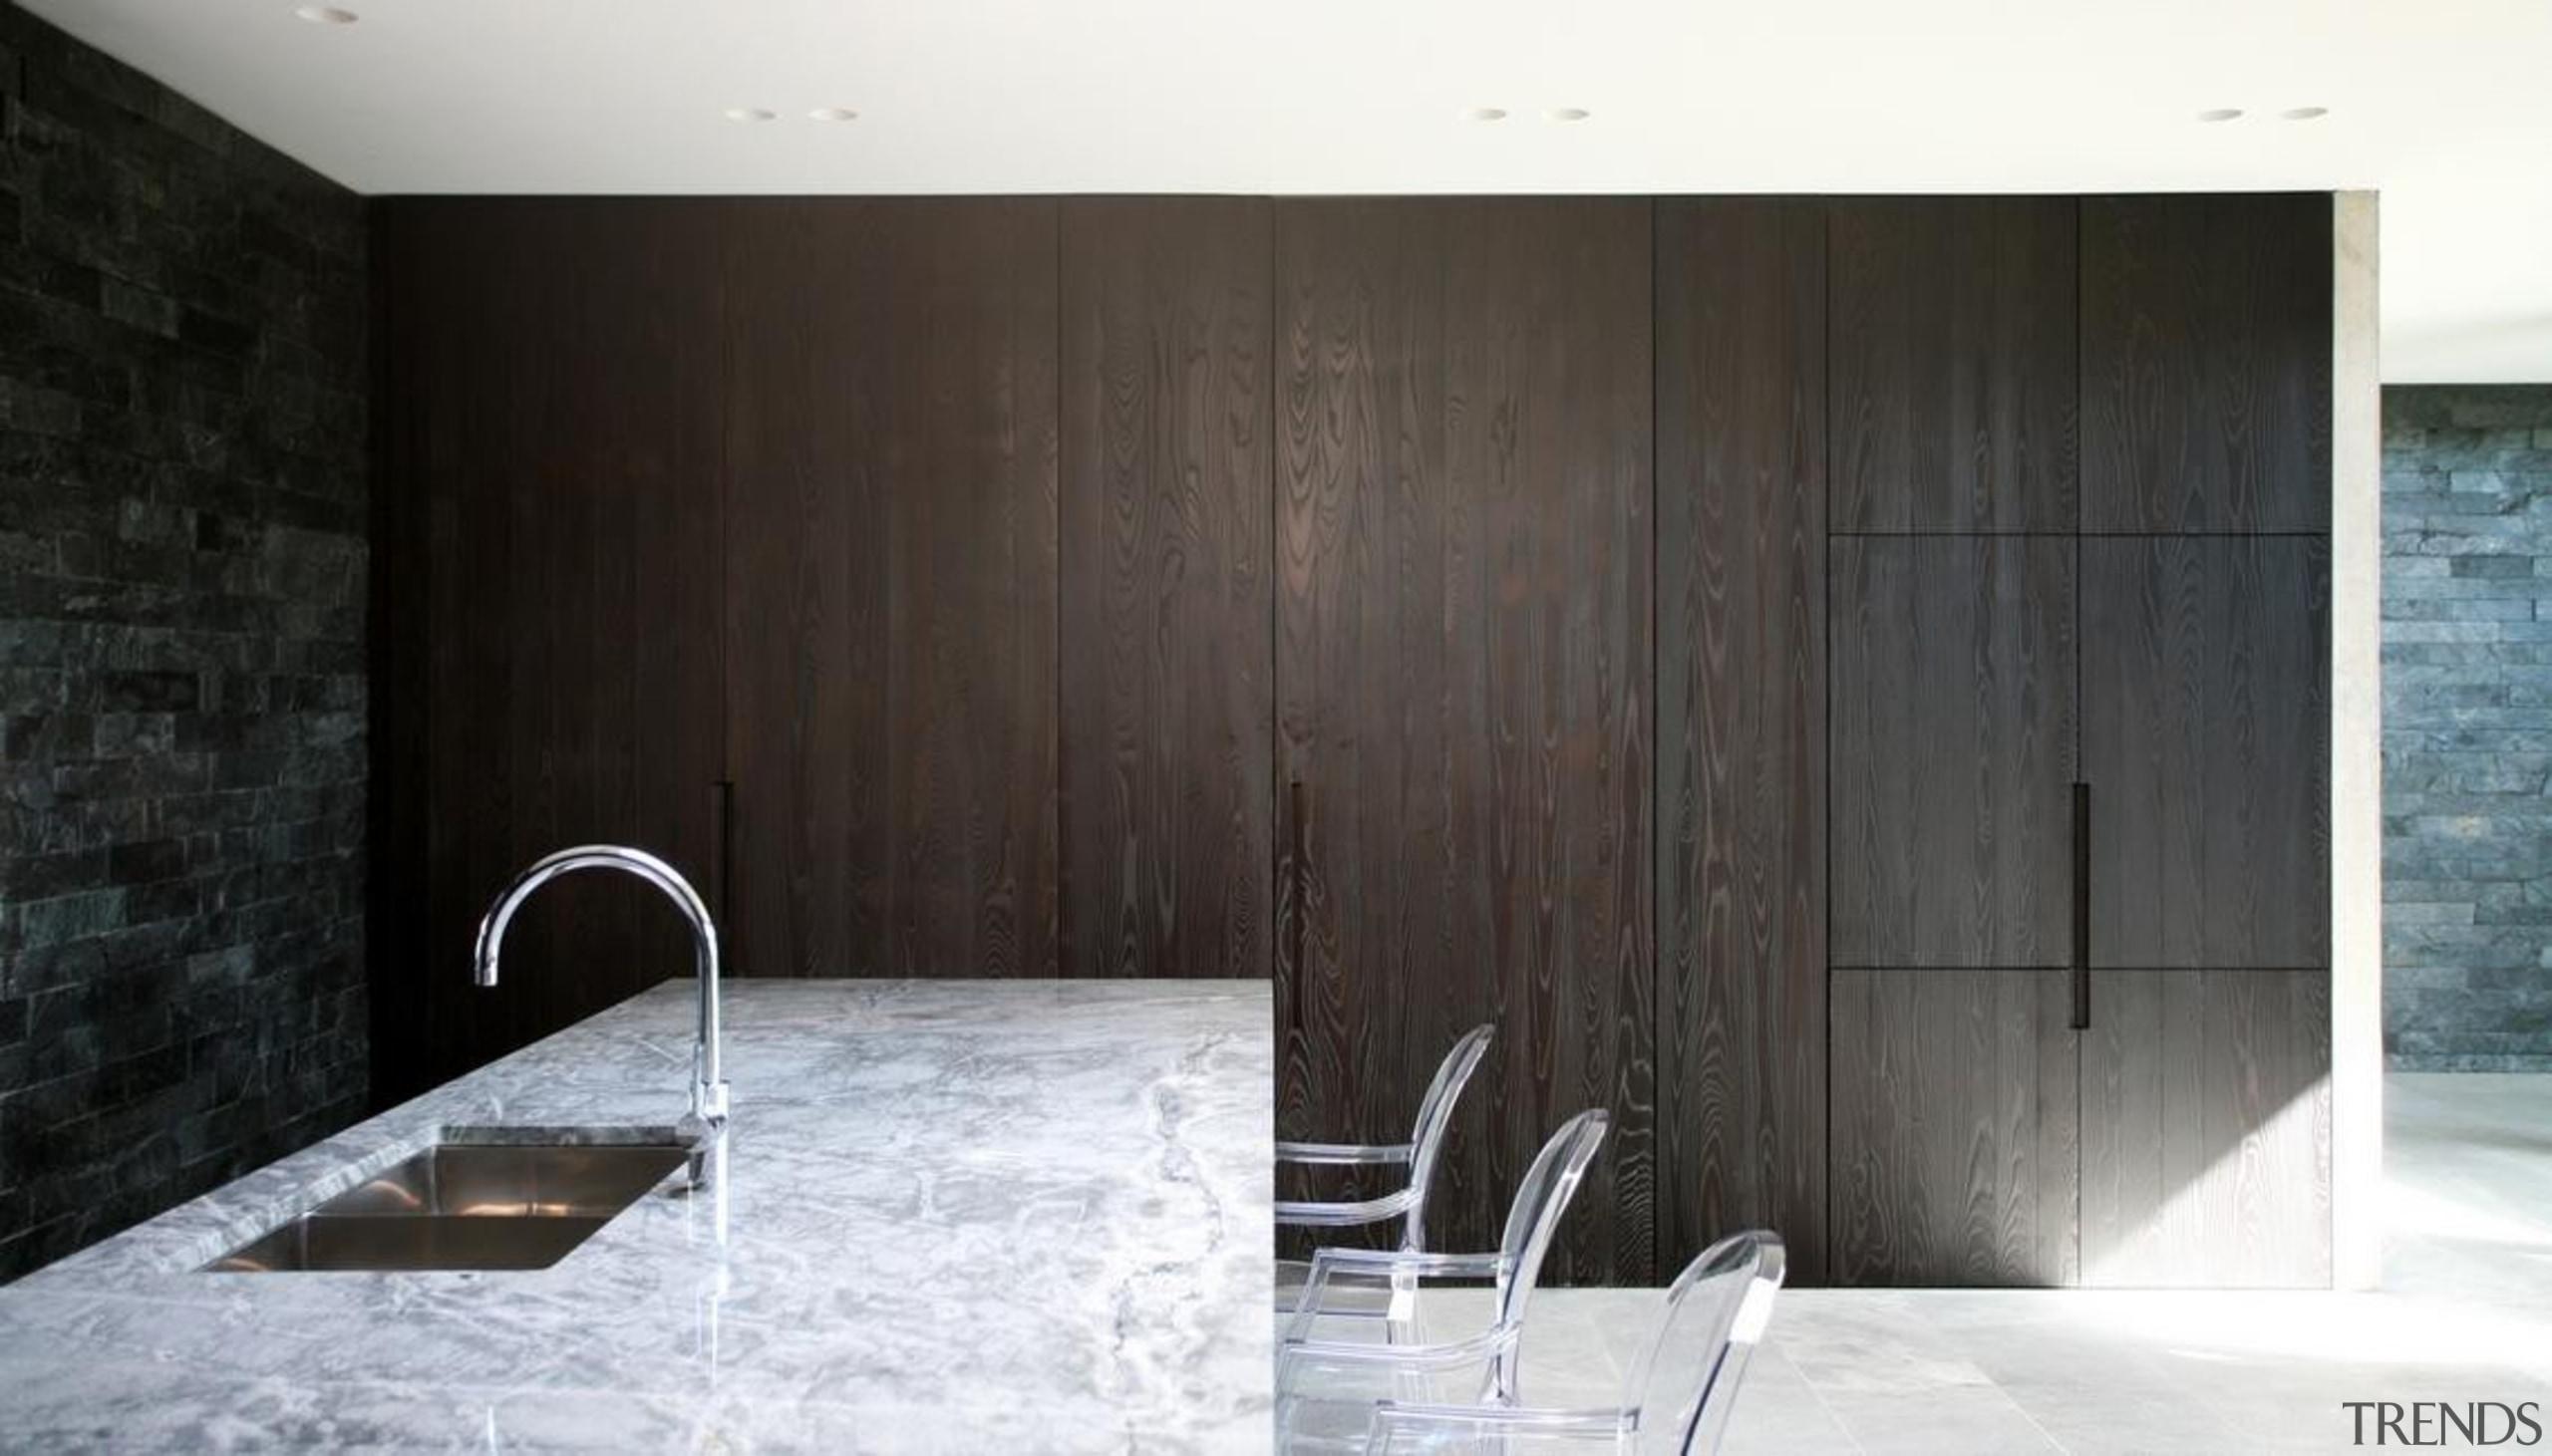 Christchurch House - Christchurch House - architecture | architecture, floor, flooring, house, interior design, wall, wood, black, white